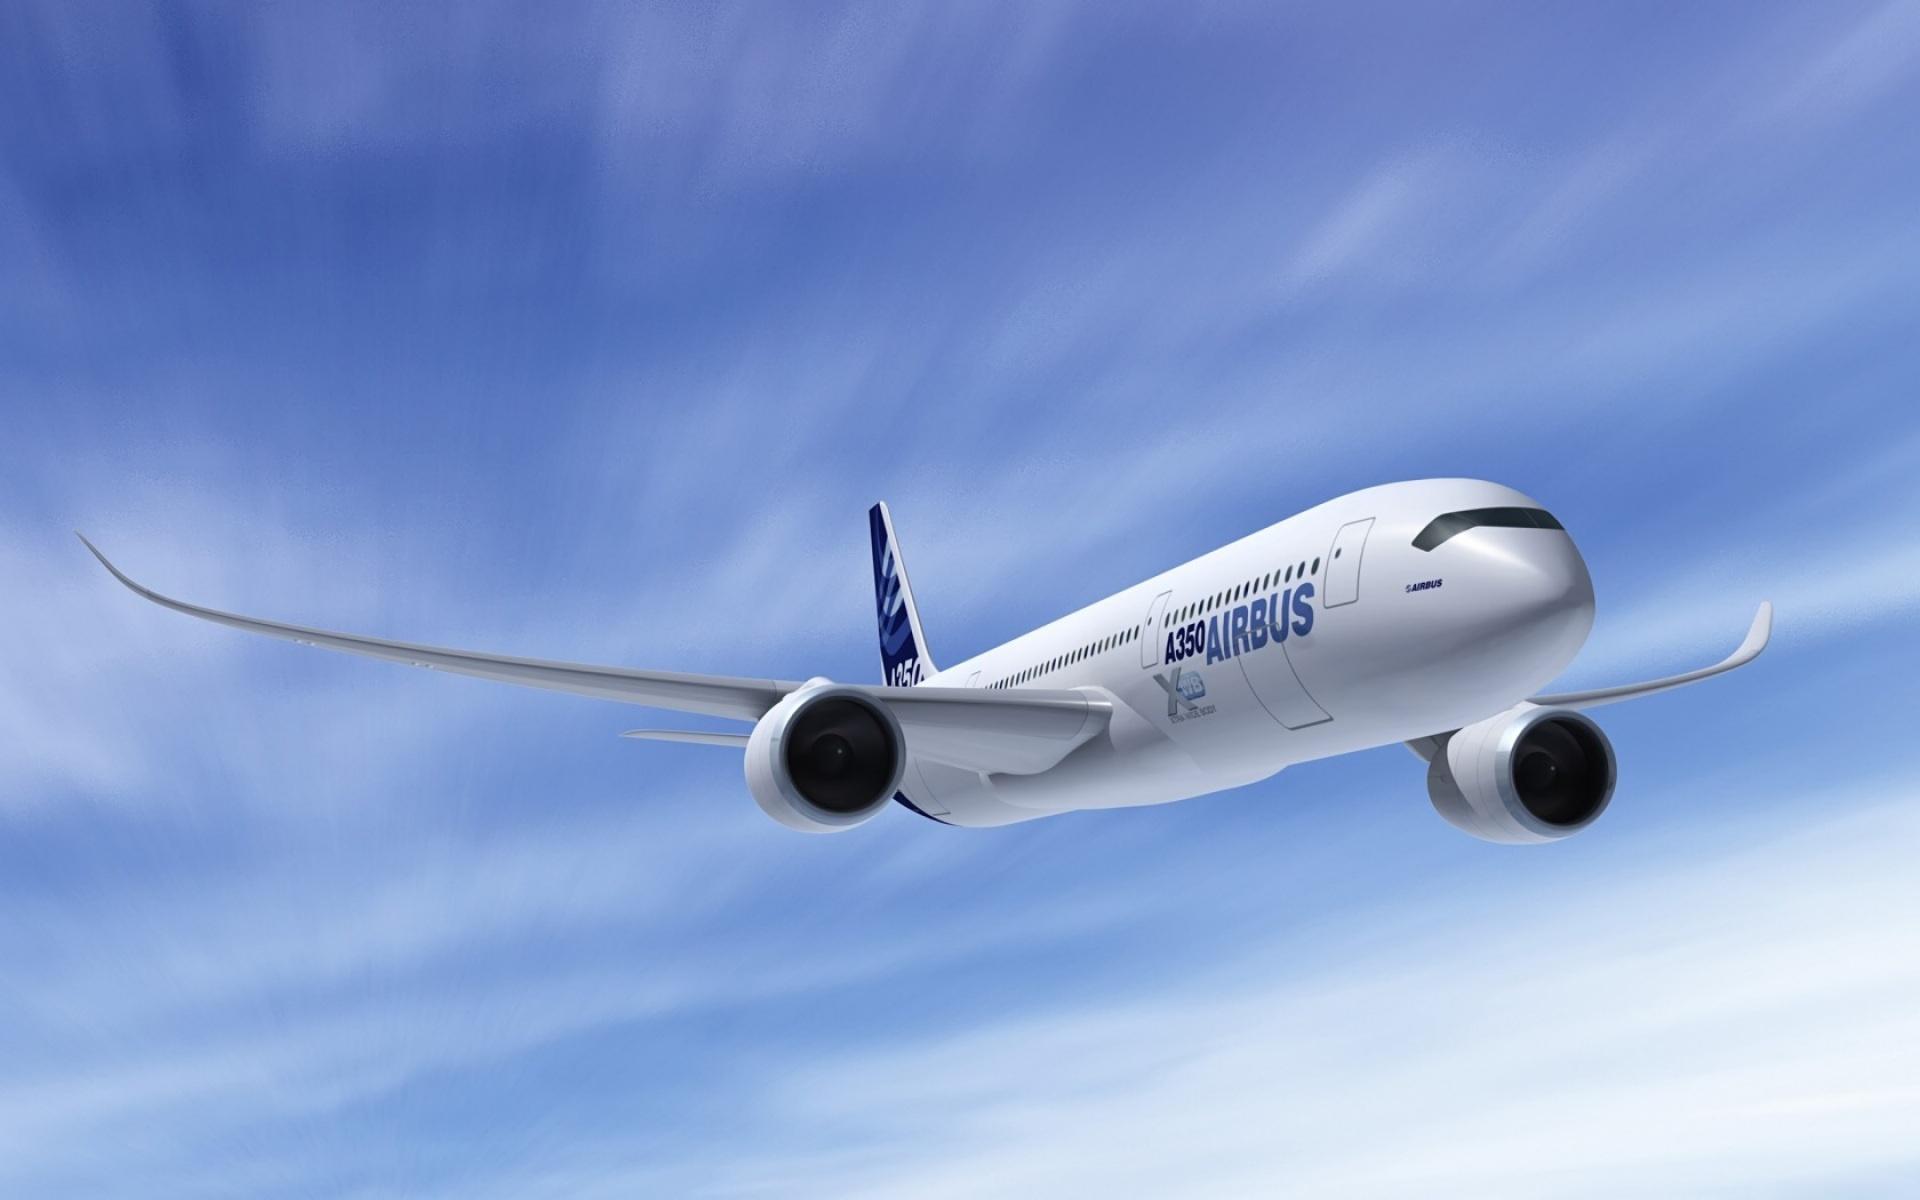 Airplane Passengers Airbas-a350 Aviation